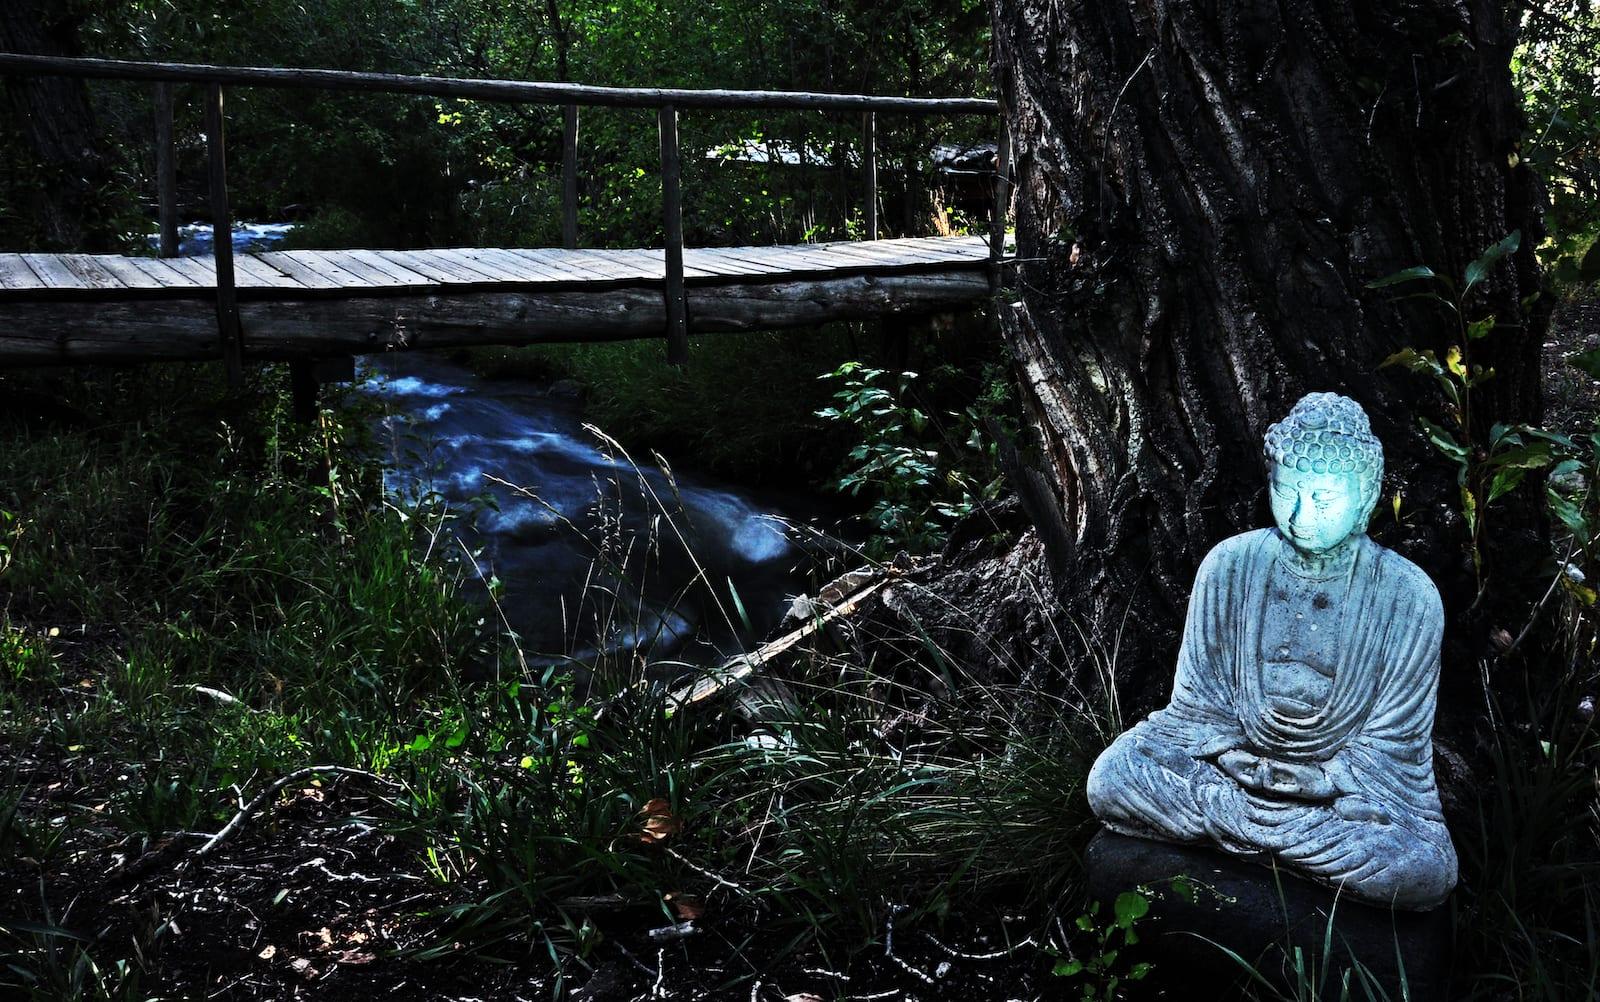 Crestone Colorado Meditating Buddha Statue